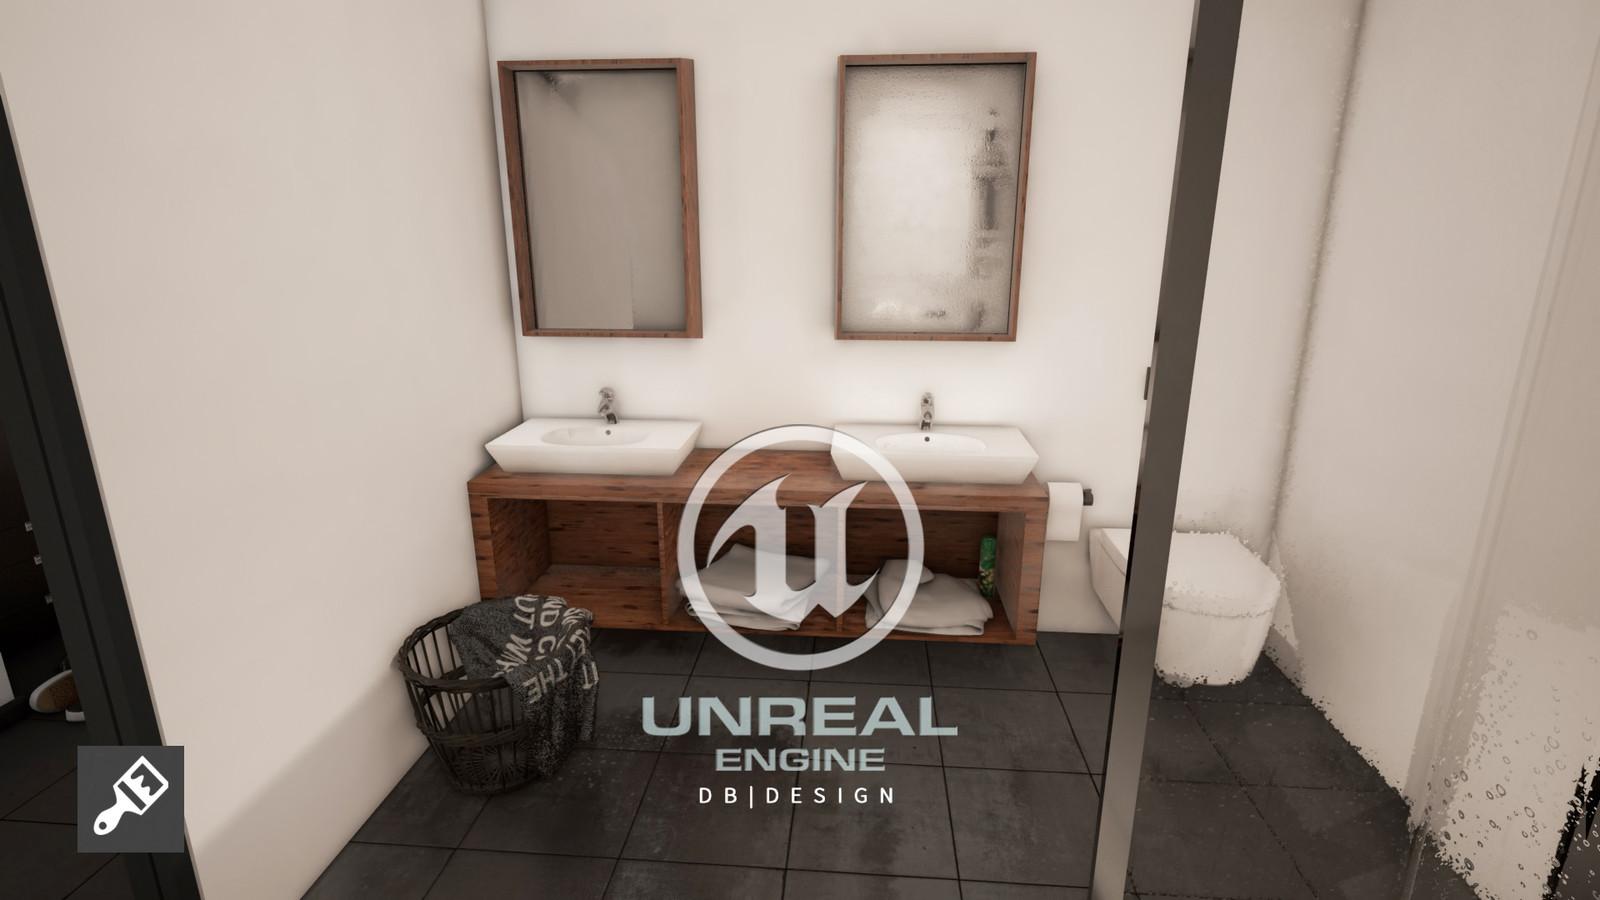 Unreal Engine 4 - Archviz Small Studio